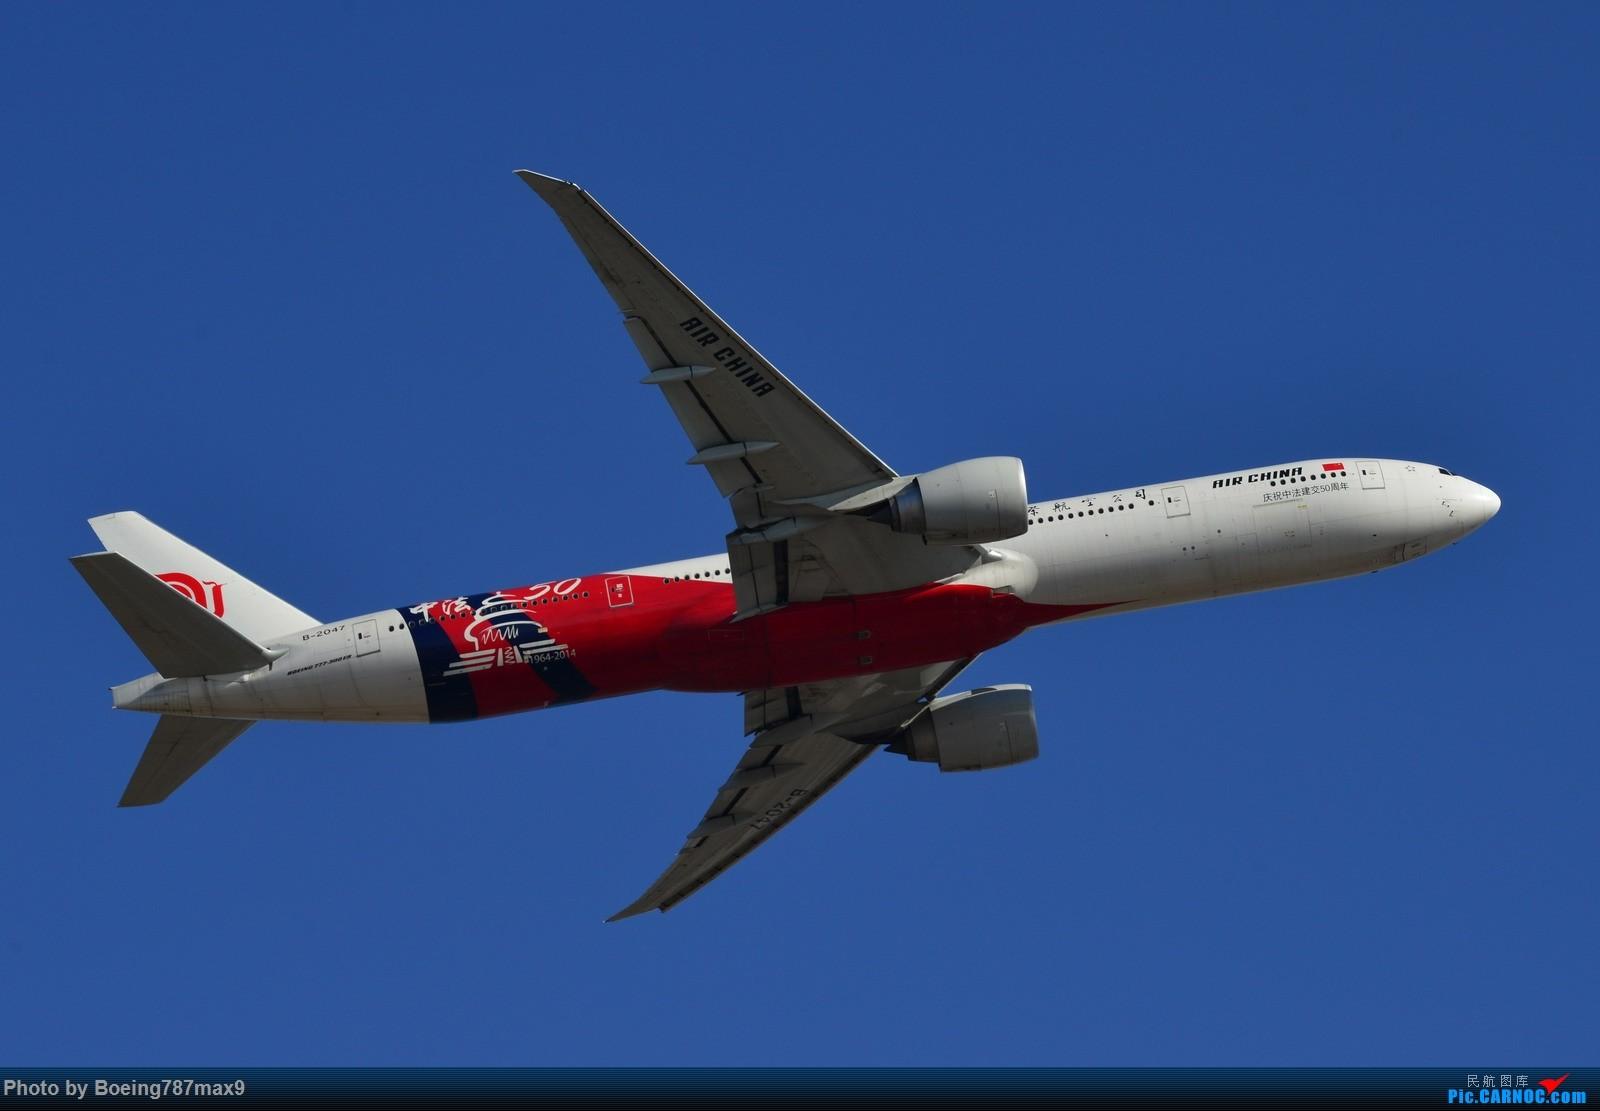 Re:[原创]【PEK】今日东停车场蹲点,好货一堆。KLM744、DELTA763、国航星空332、国航748、最重要的是朝鲜的图204、还有国航中法50年77W、汉莎346 BOEING 777-300ER B-2047 中国北京首都国际机场